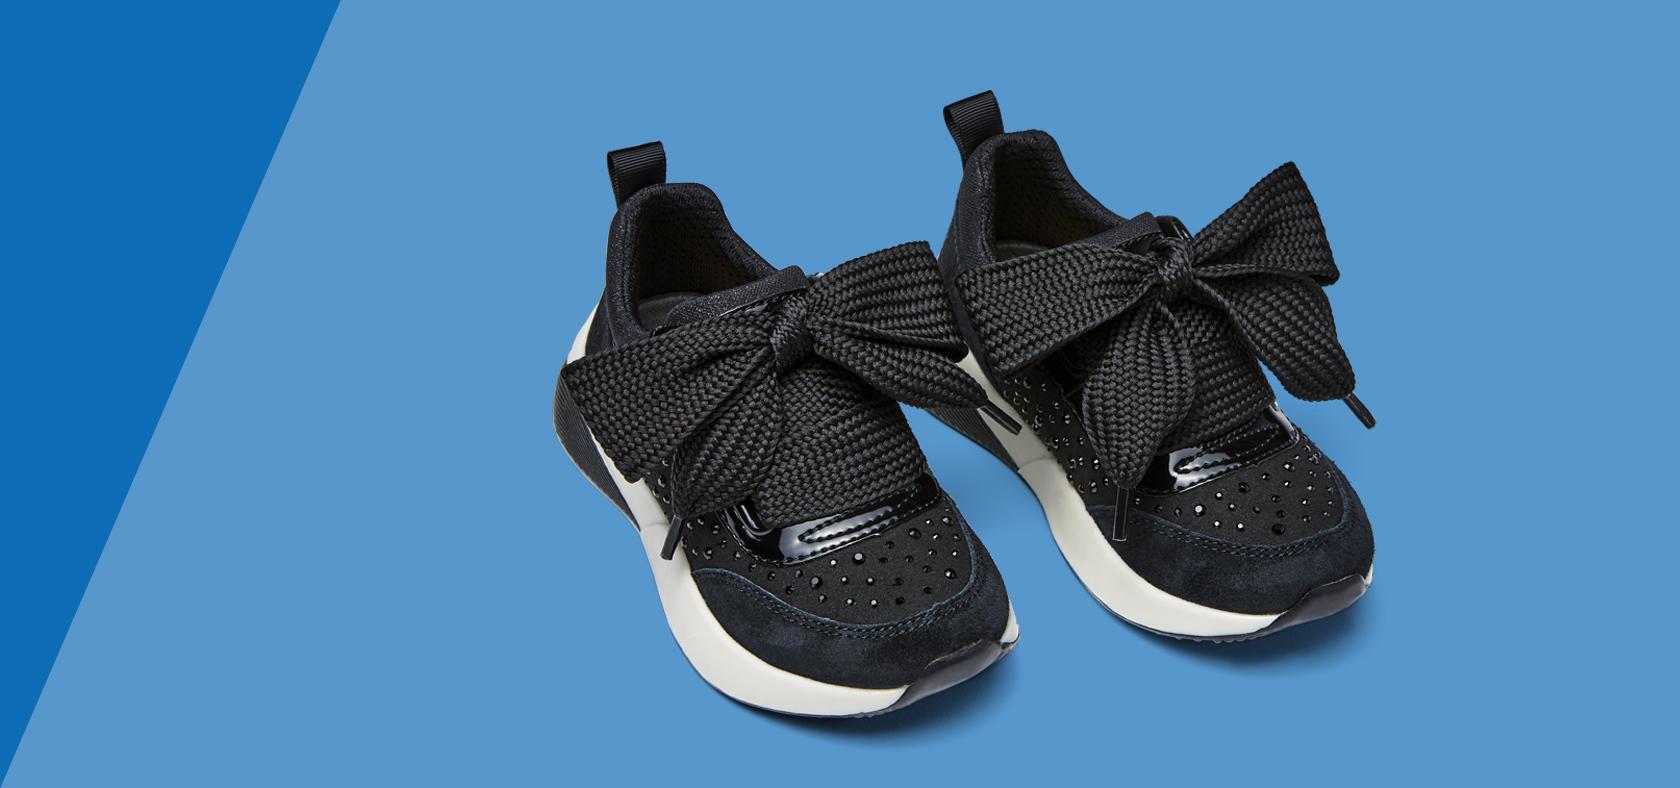 geox donna 35 sneakers in vendita | eBay